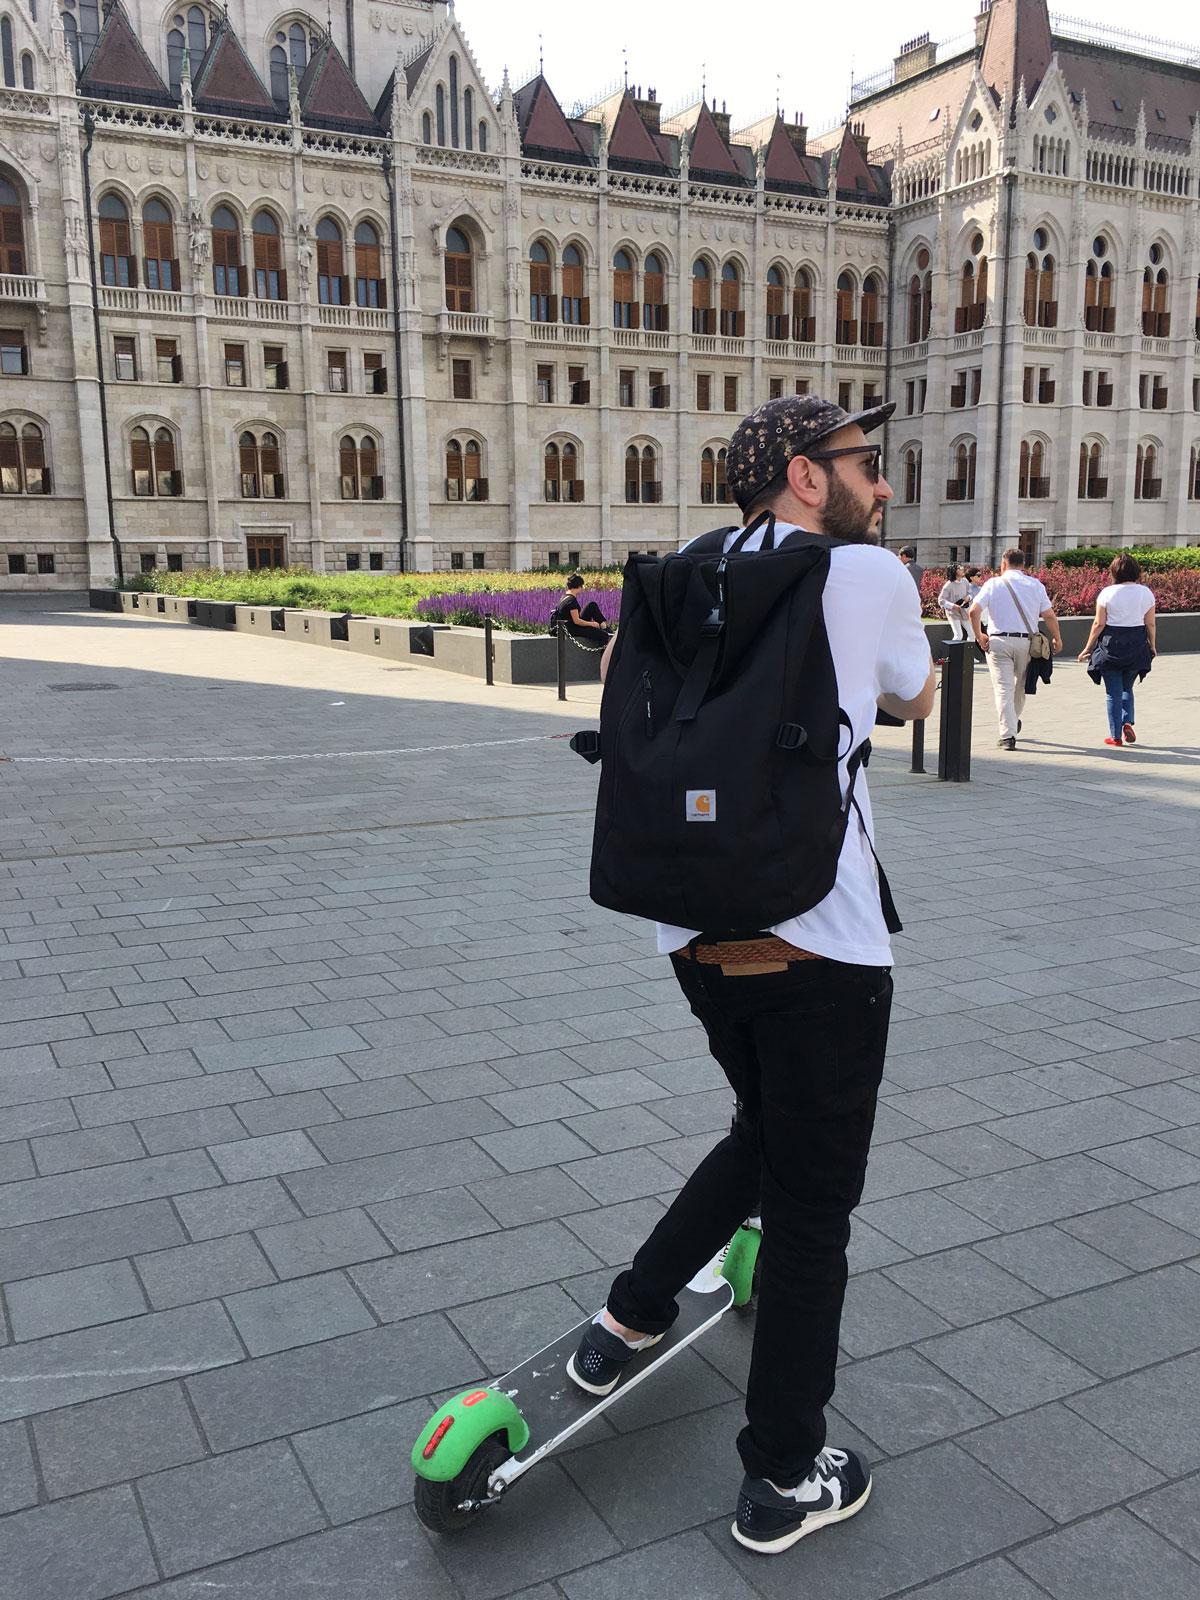 budapest_parliament3.jpg